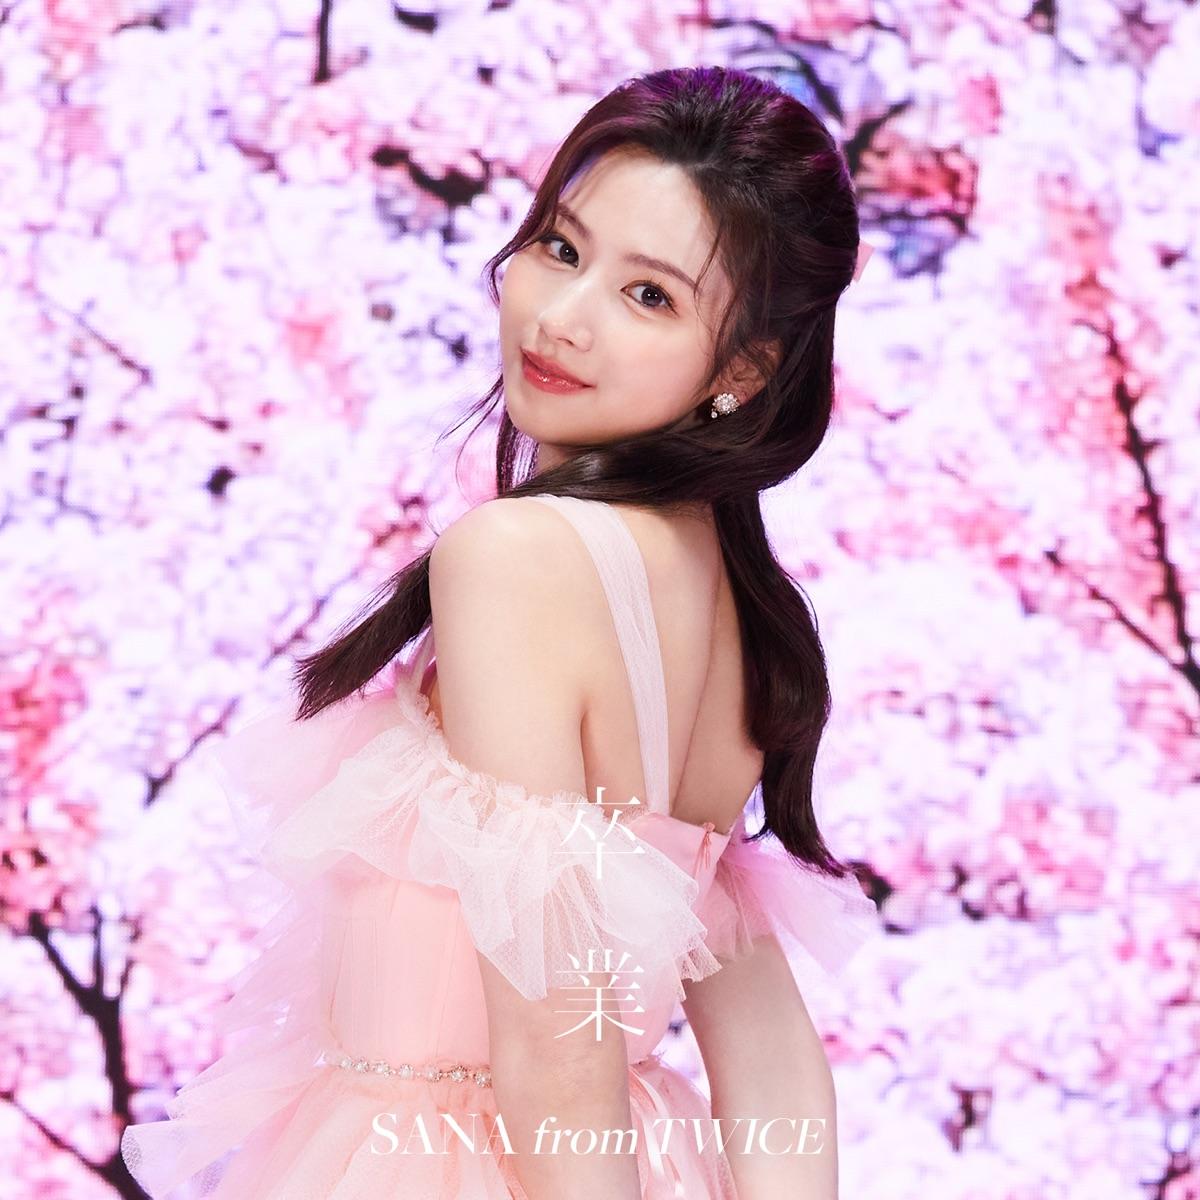 『SANA from TWICE - 卒業 (カバー)』収録の『卒業 (カバー)』ジャケット